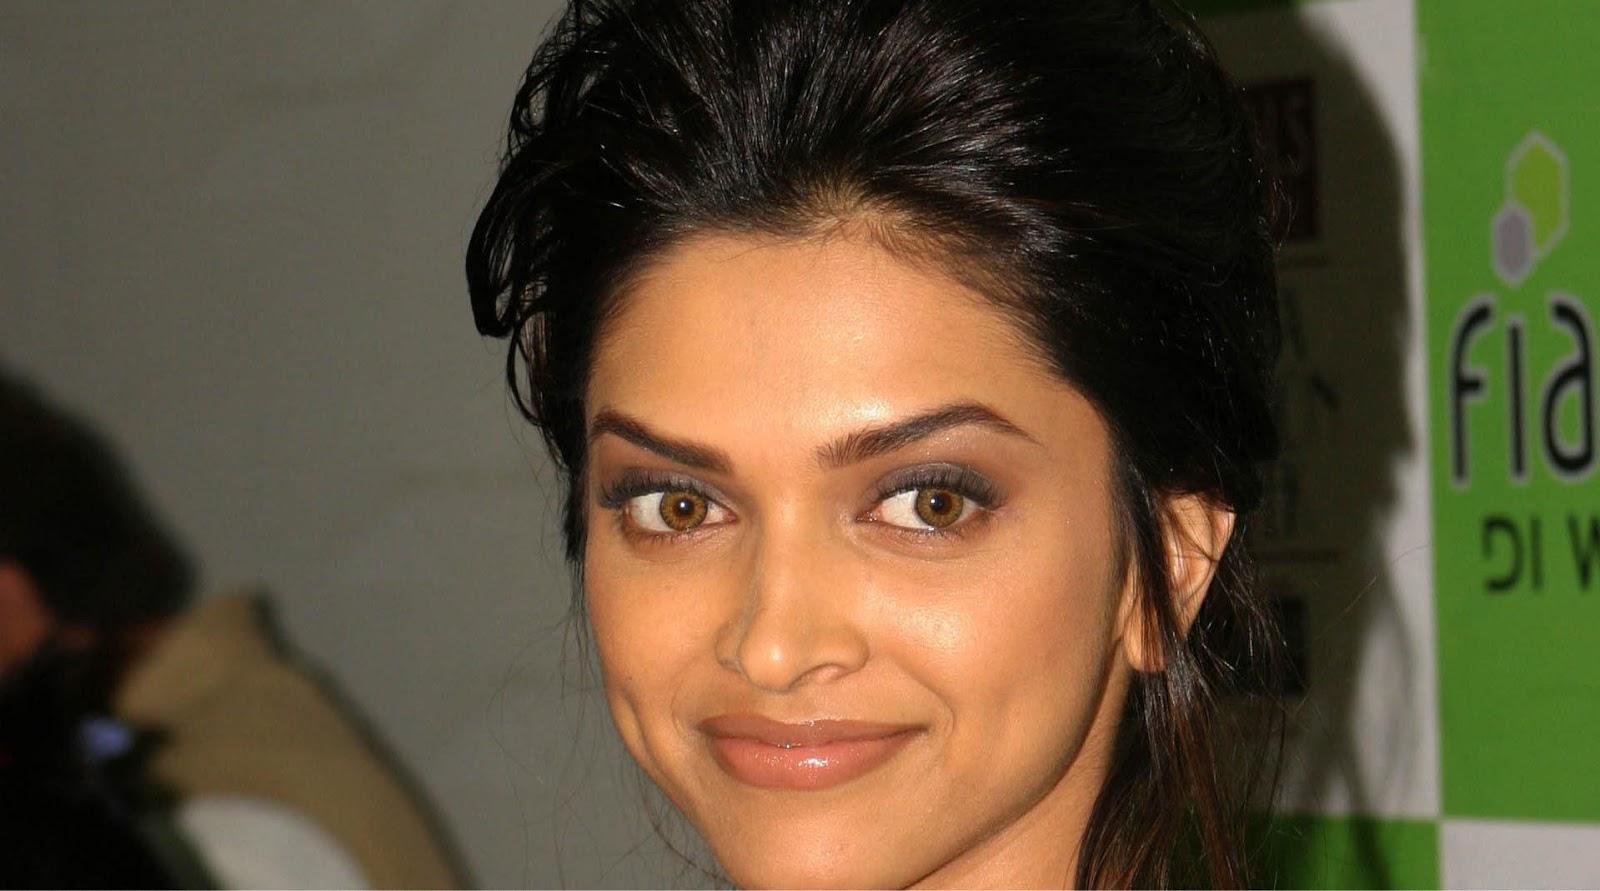 Free Download Wallpaper Hd  Bollywood Actress Deepika -5145